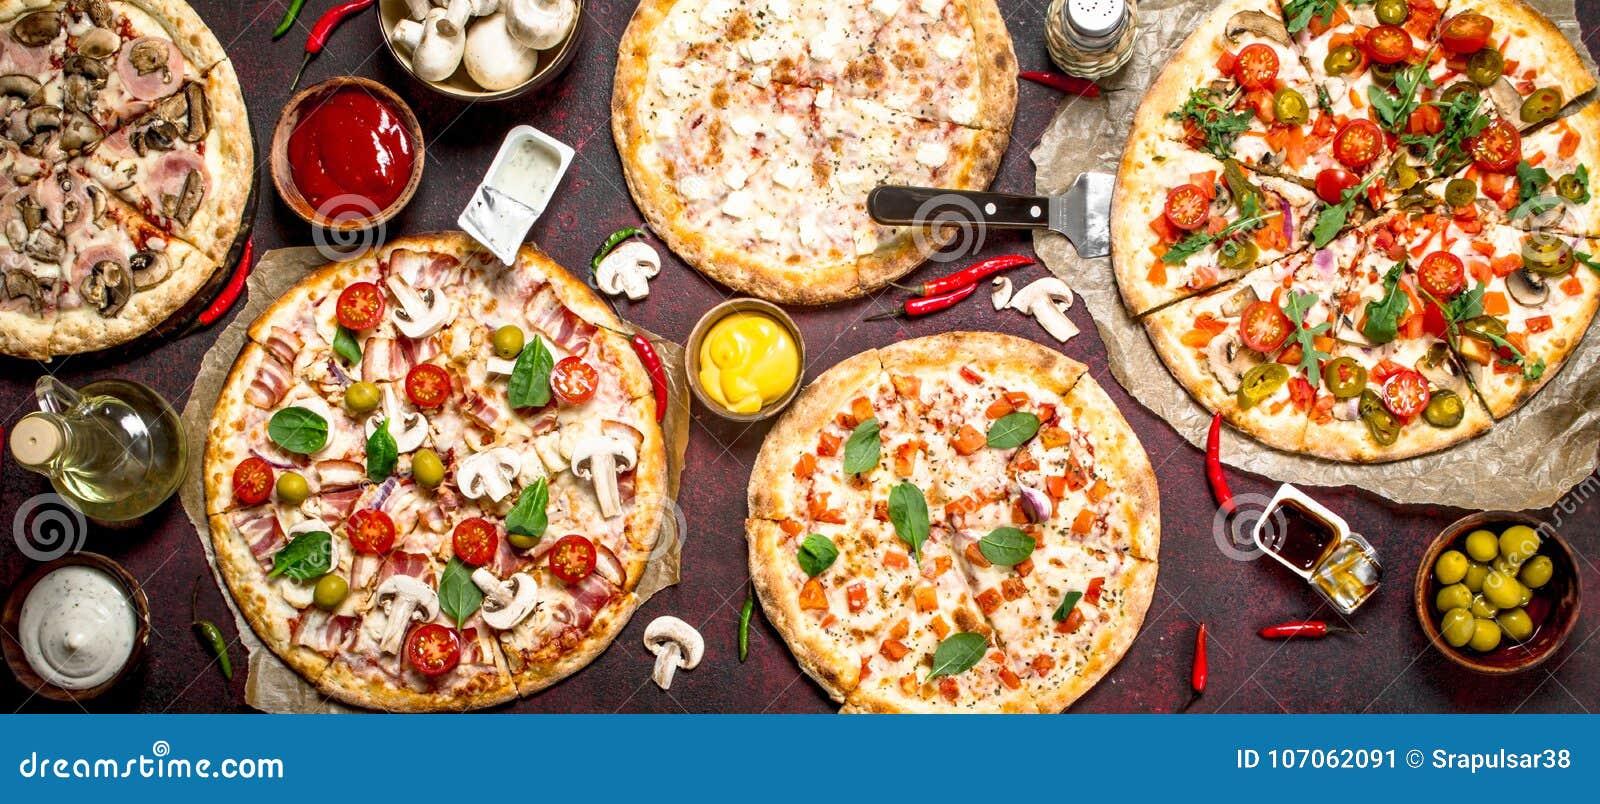 разнообразие пицц с соусами